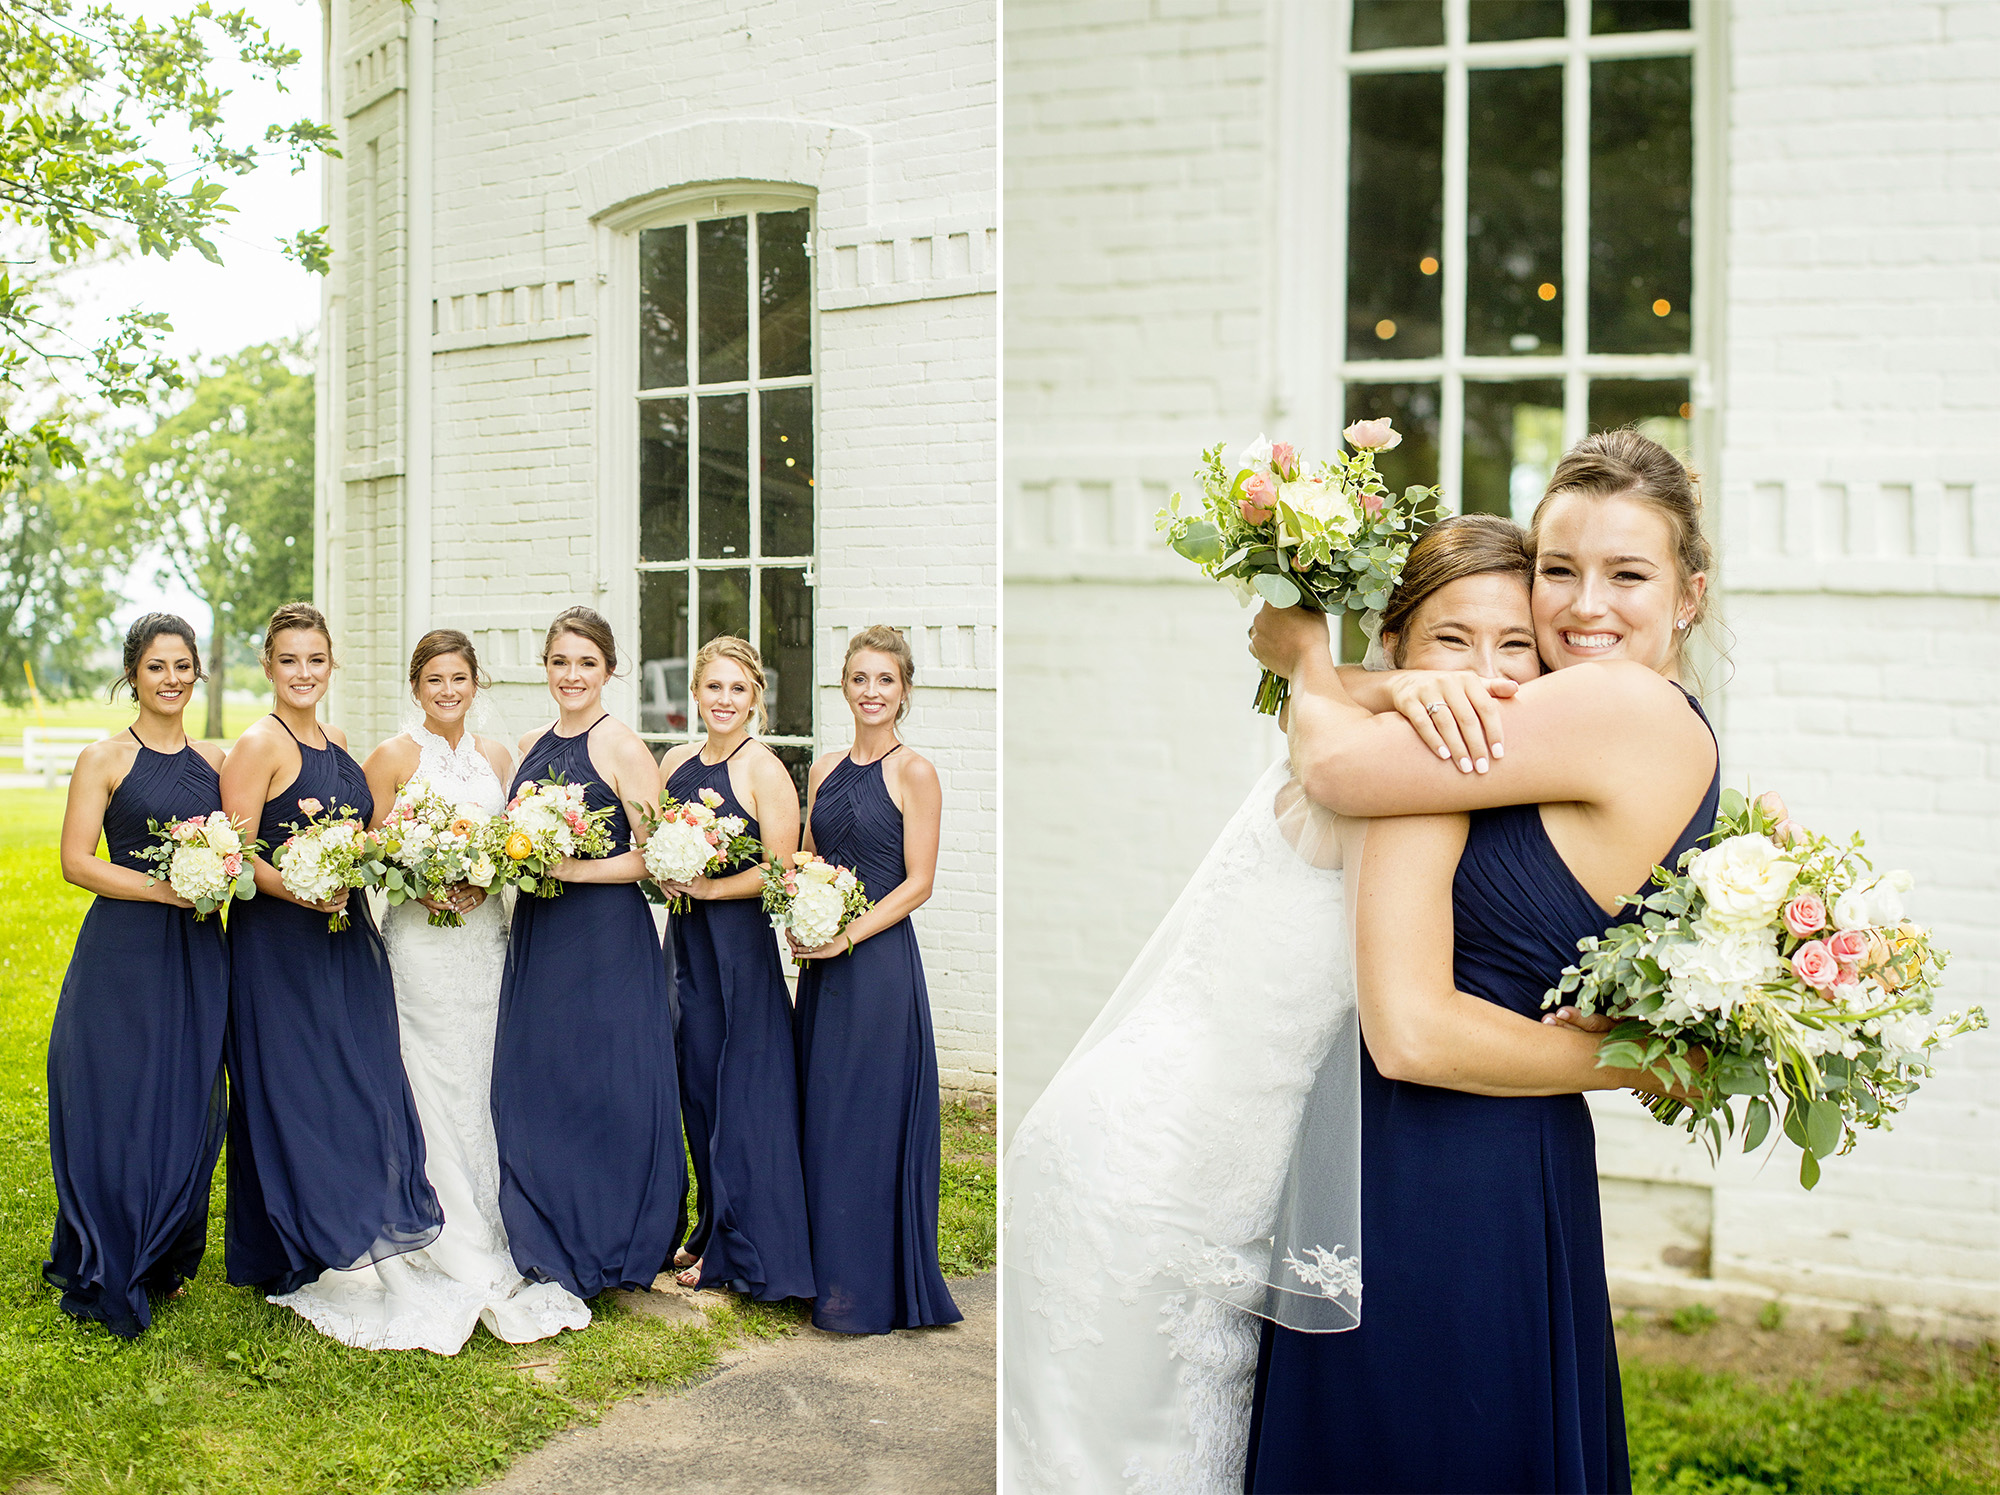 Seriously_Sabrina_Photography_Lexington_Kentucky_Round_Barn_Red_Mile_Stable_of_Memories_Wedding_Hart_47.jpg